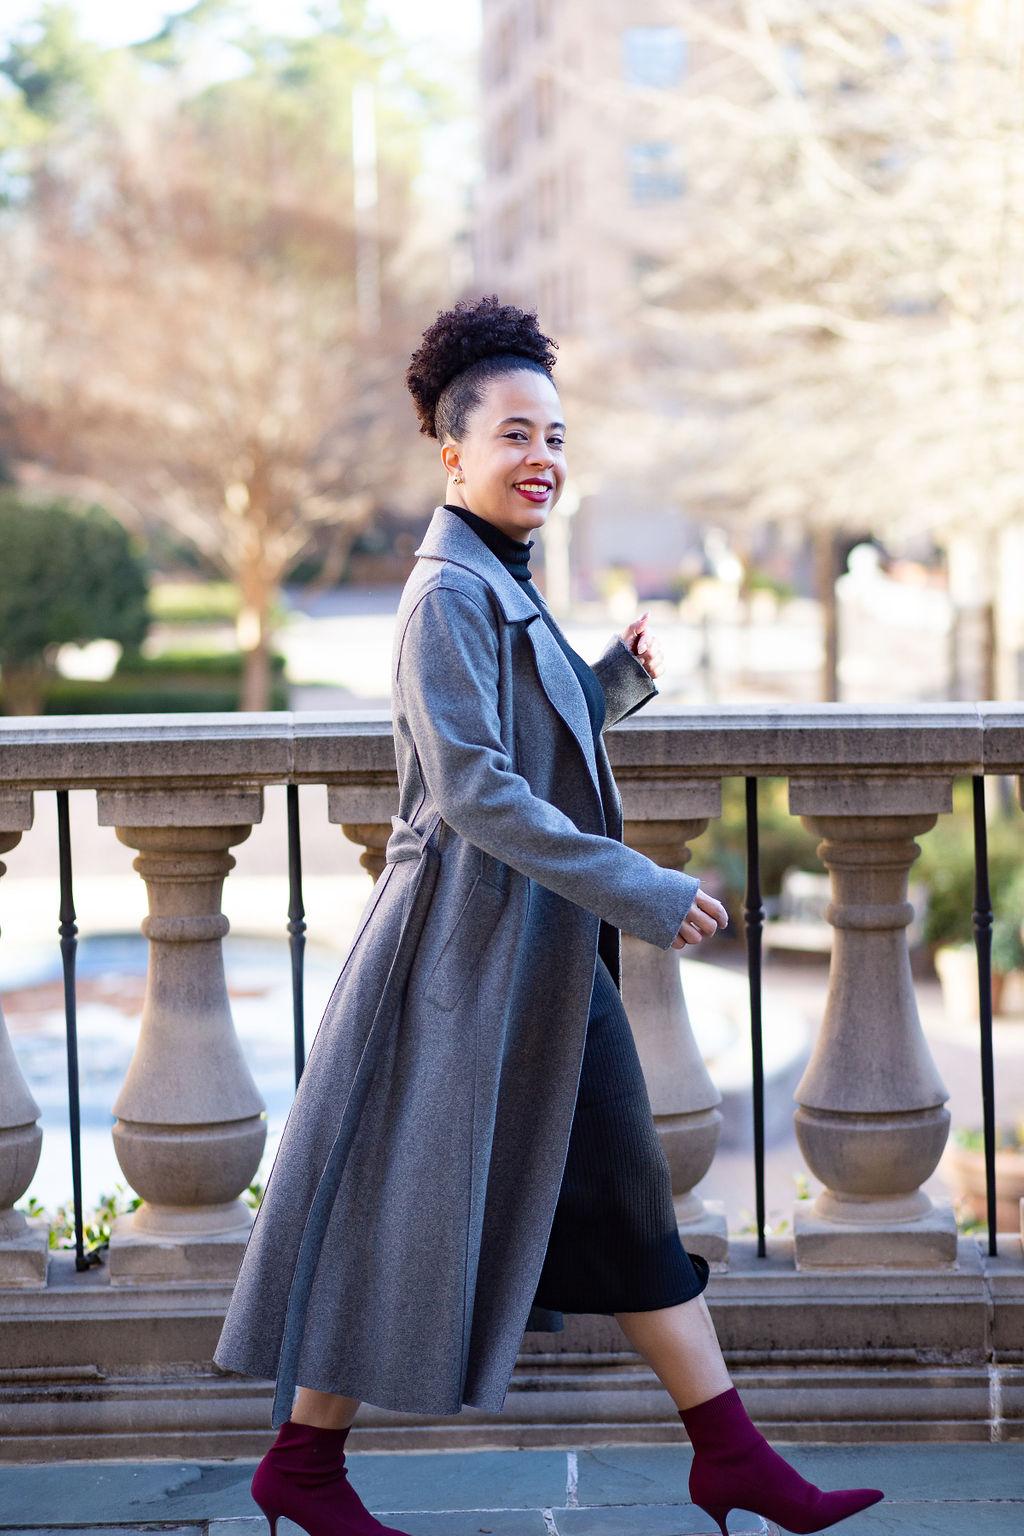 grey trench coat with black dress.jpg